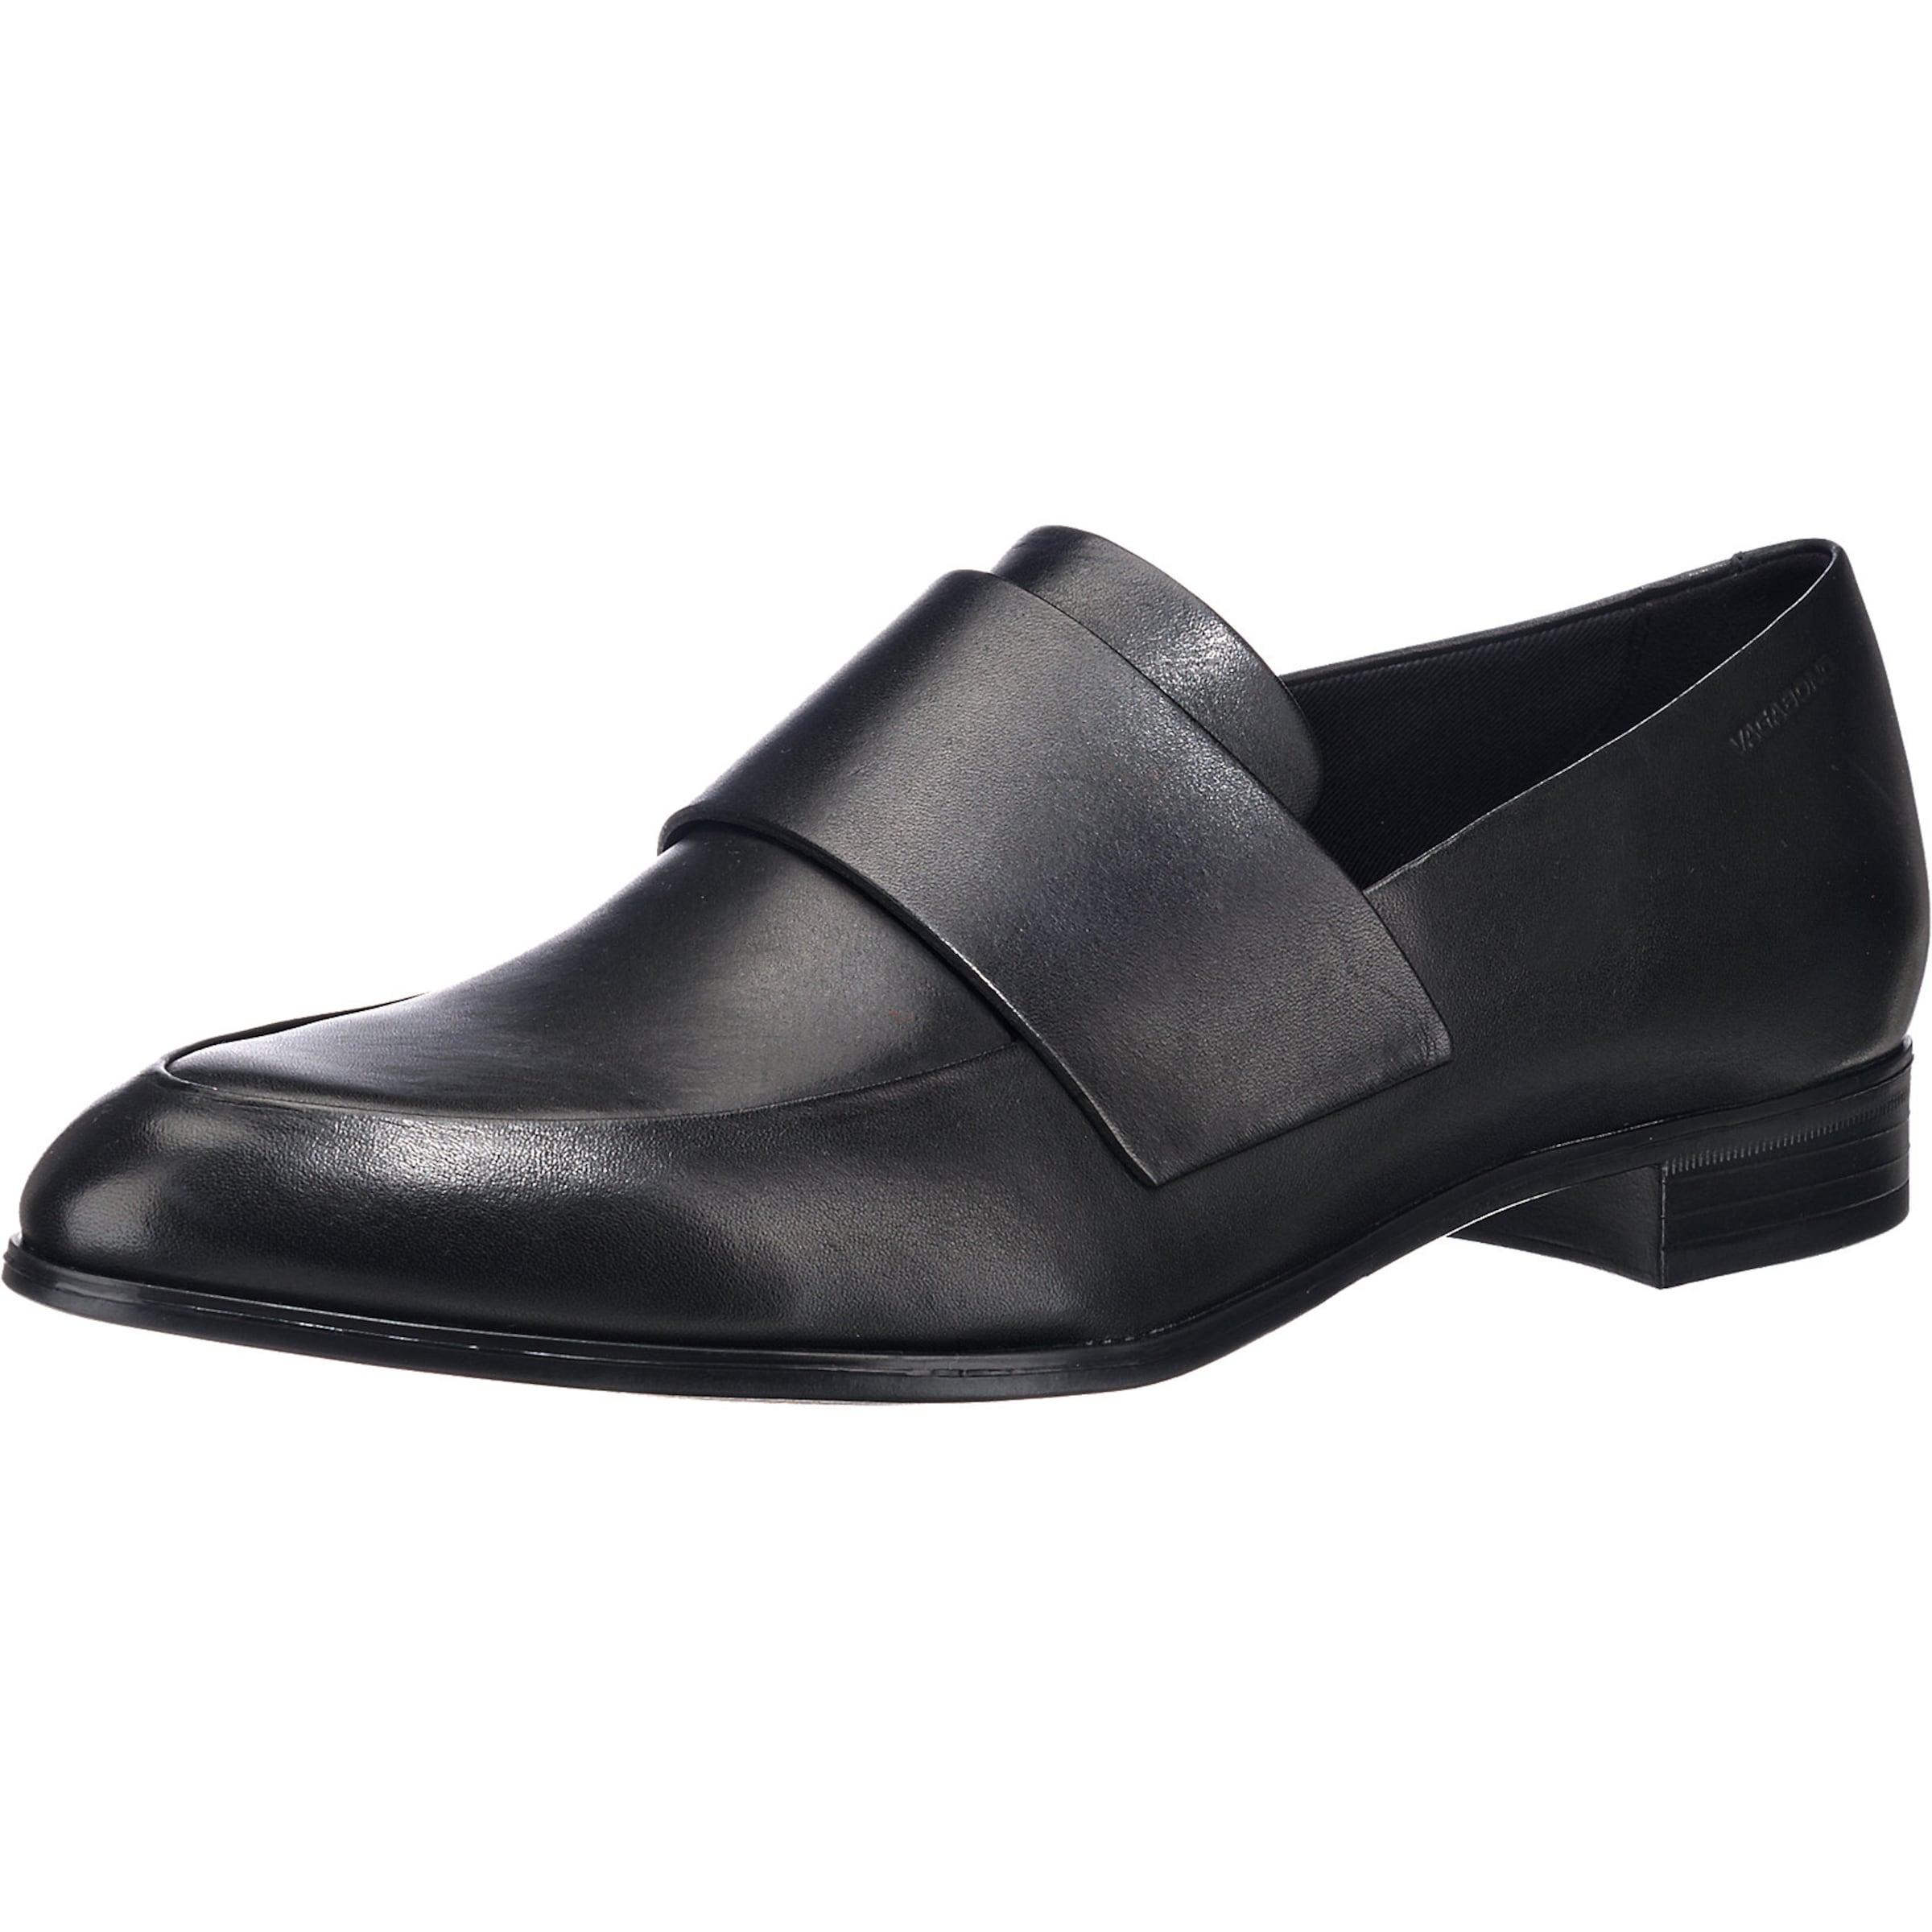 VAGABOND SHOEMAKERS Frances Slipper Verschleißfeste billige Schuhe